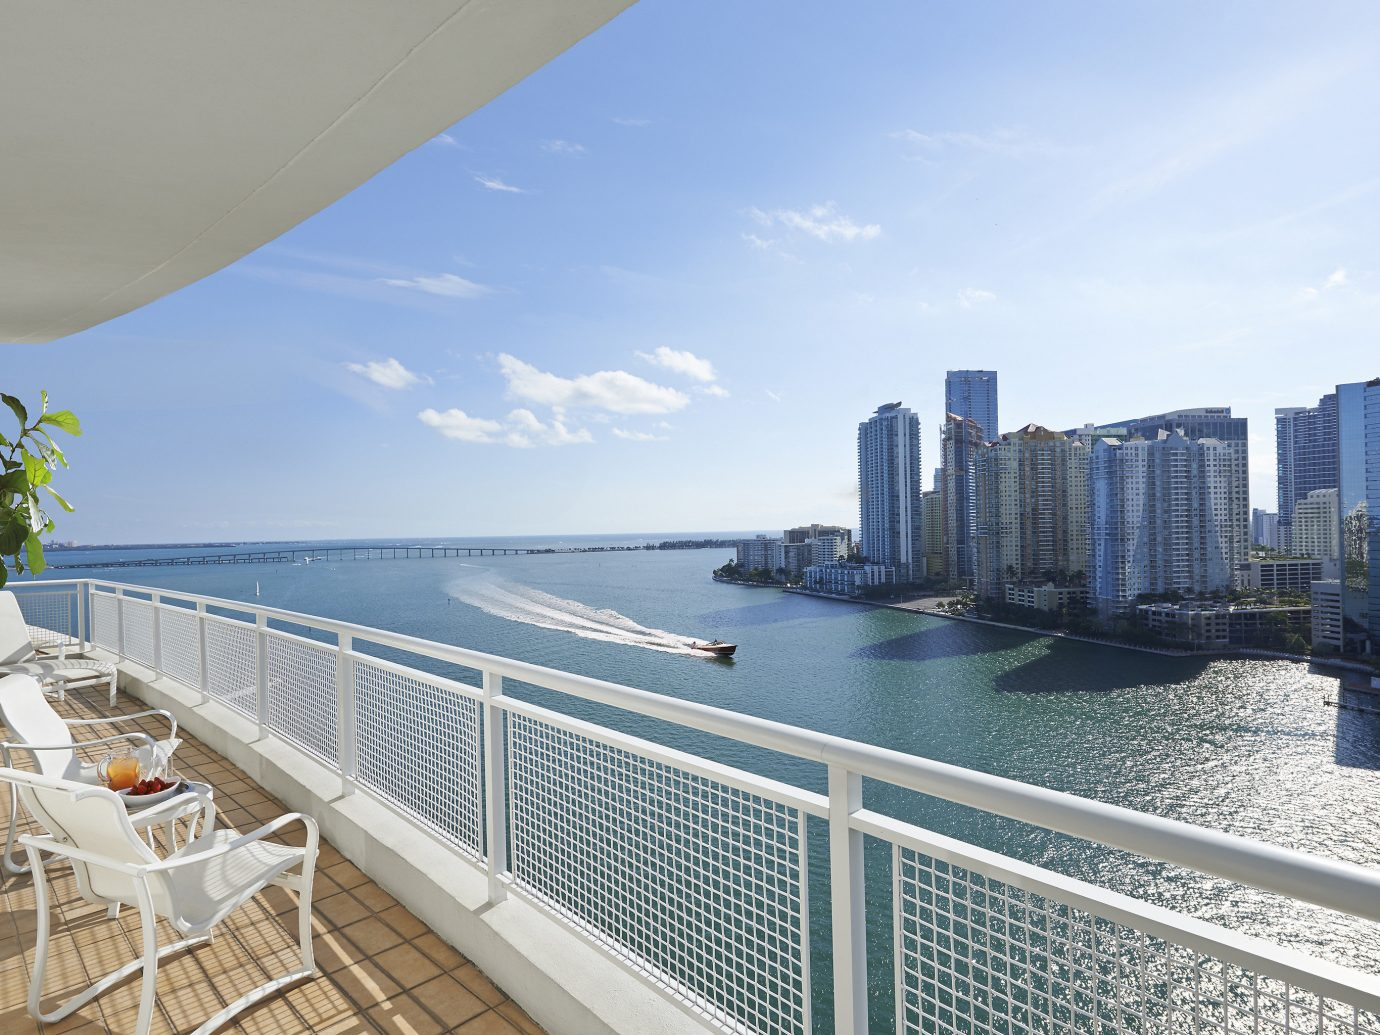 Hotels Luxury Miami Miami Beach Sea condominium water sky real estate metropolitan area City daytime apartment skyscraper building skyline tower block fixed link hotel vacation Ocean